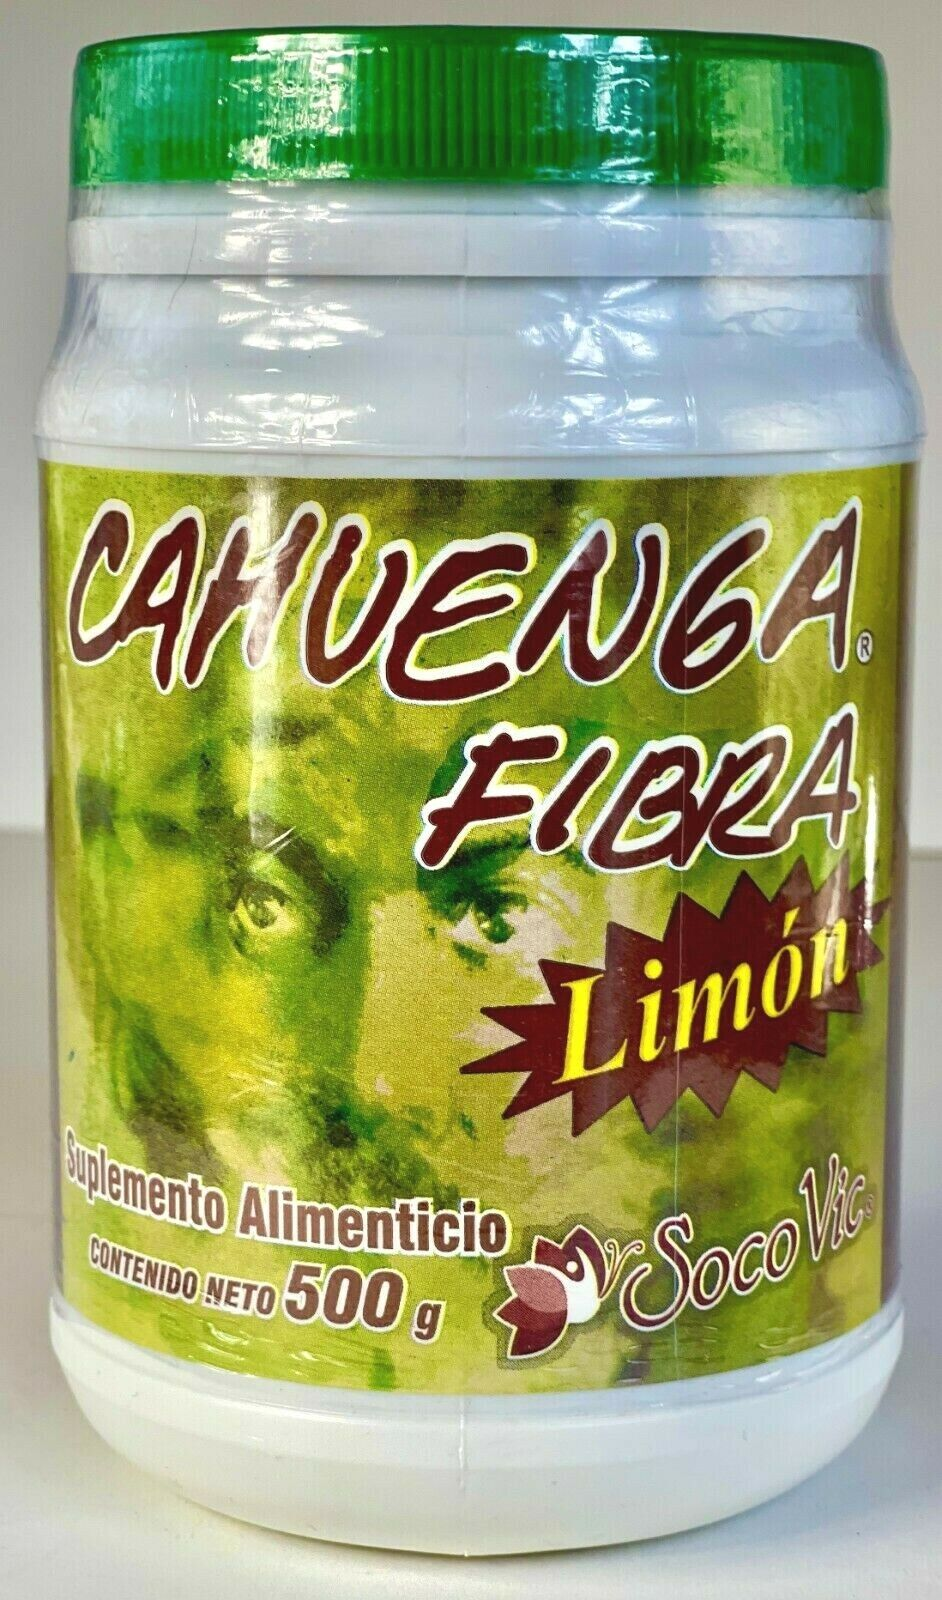 Cahuenga Fiber 500g./Fibra Mexicana Sabor Limon Suplemento Alimenticio